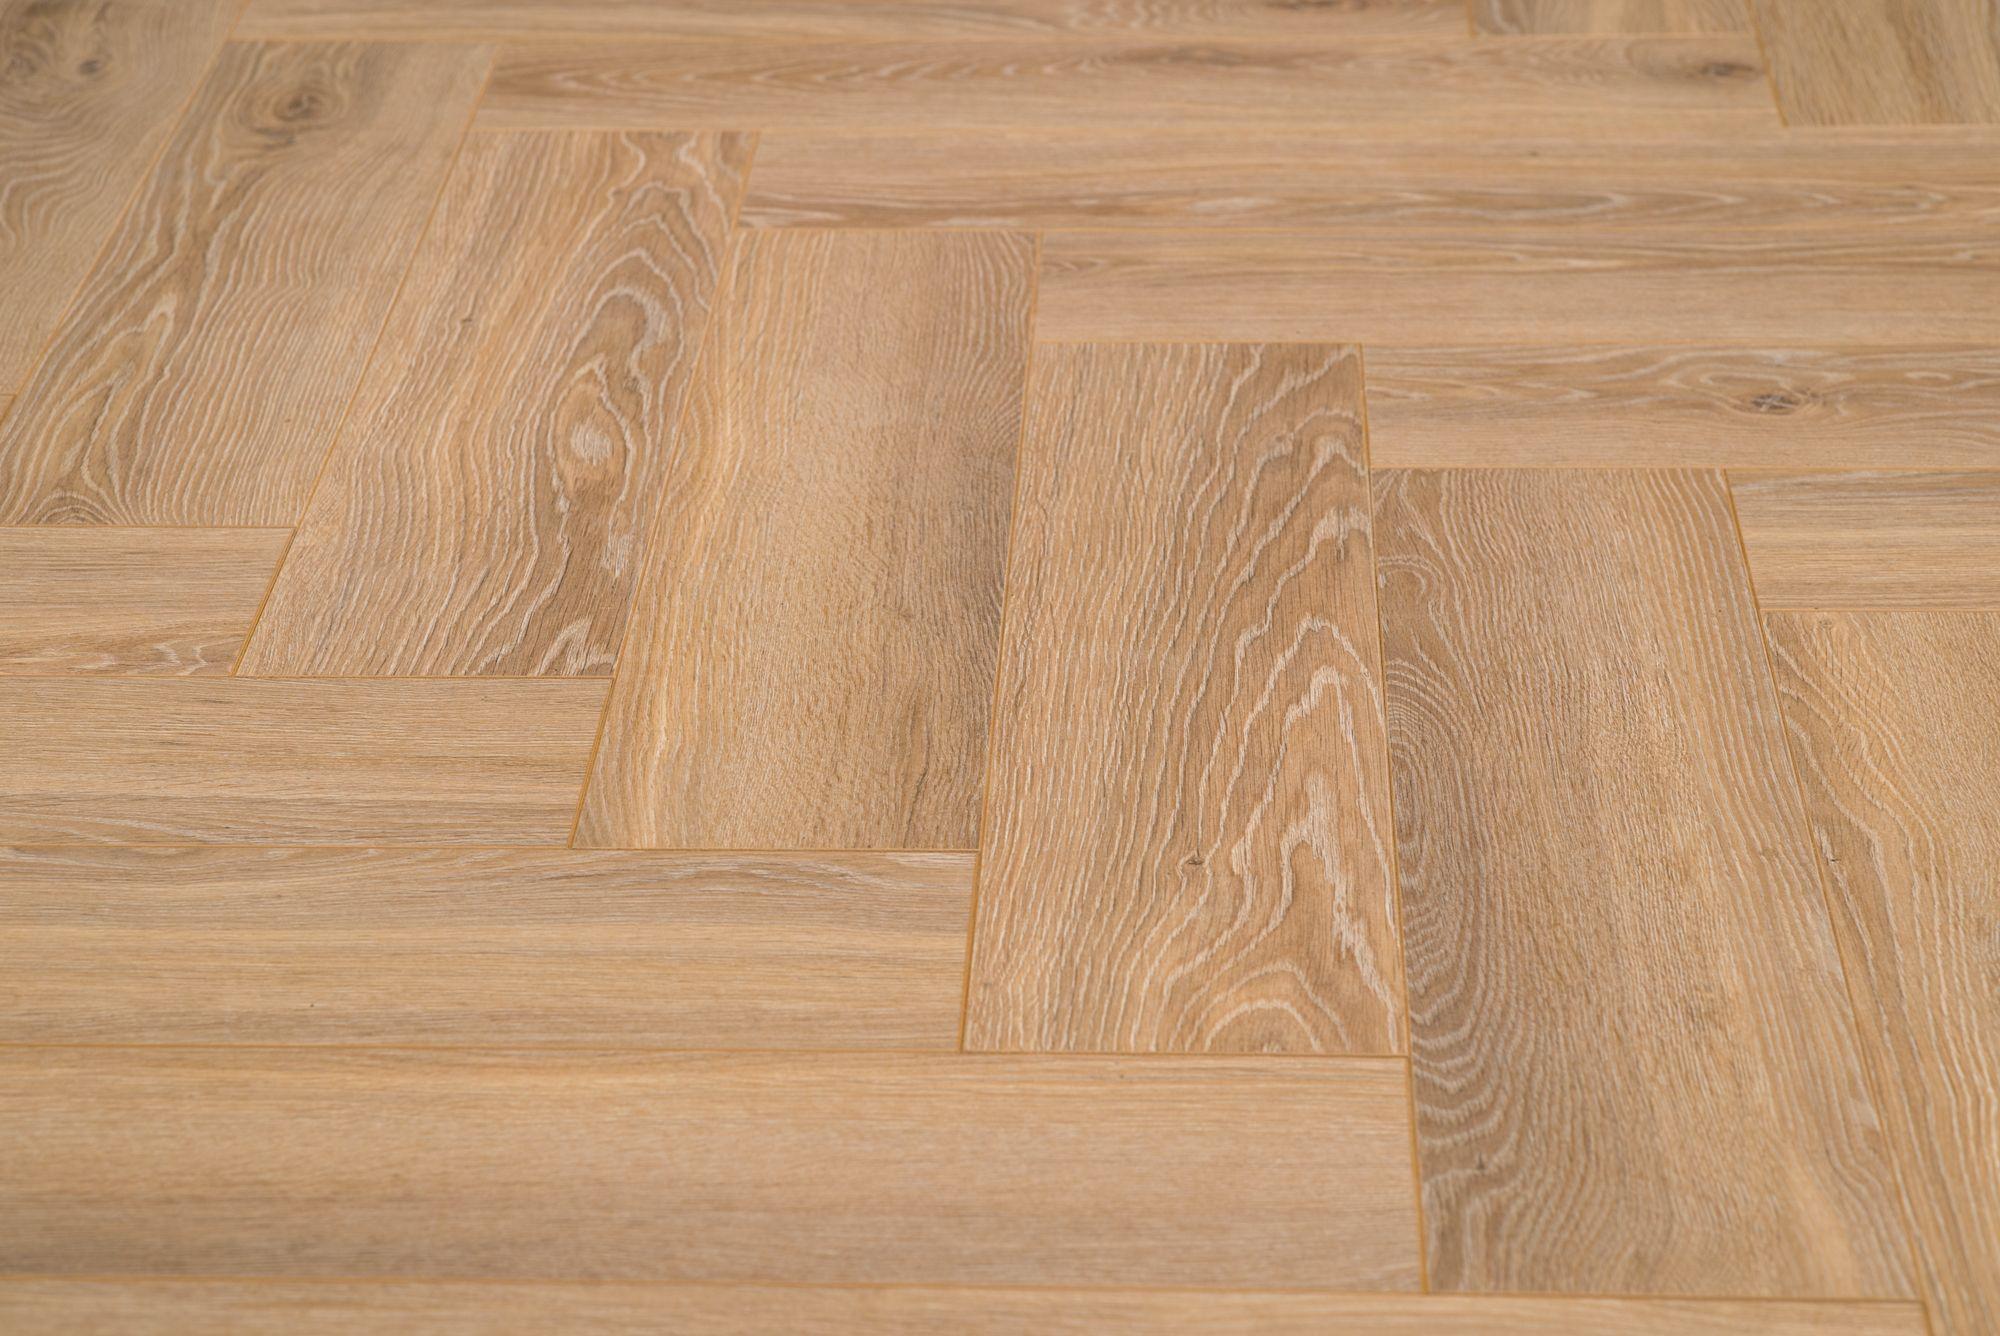 Visgraat Laminaat Leggen : Floer visgraat laminaat vloer natuur eiken cm